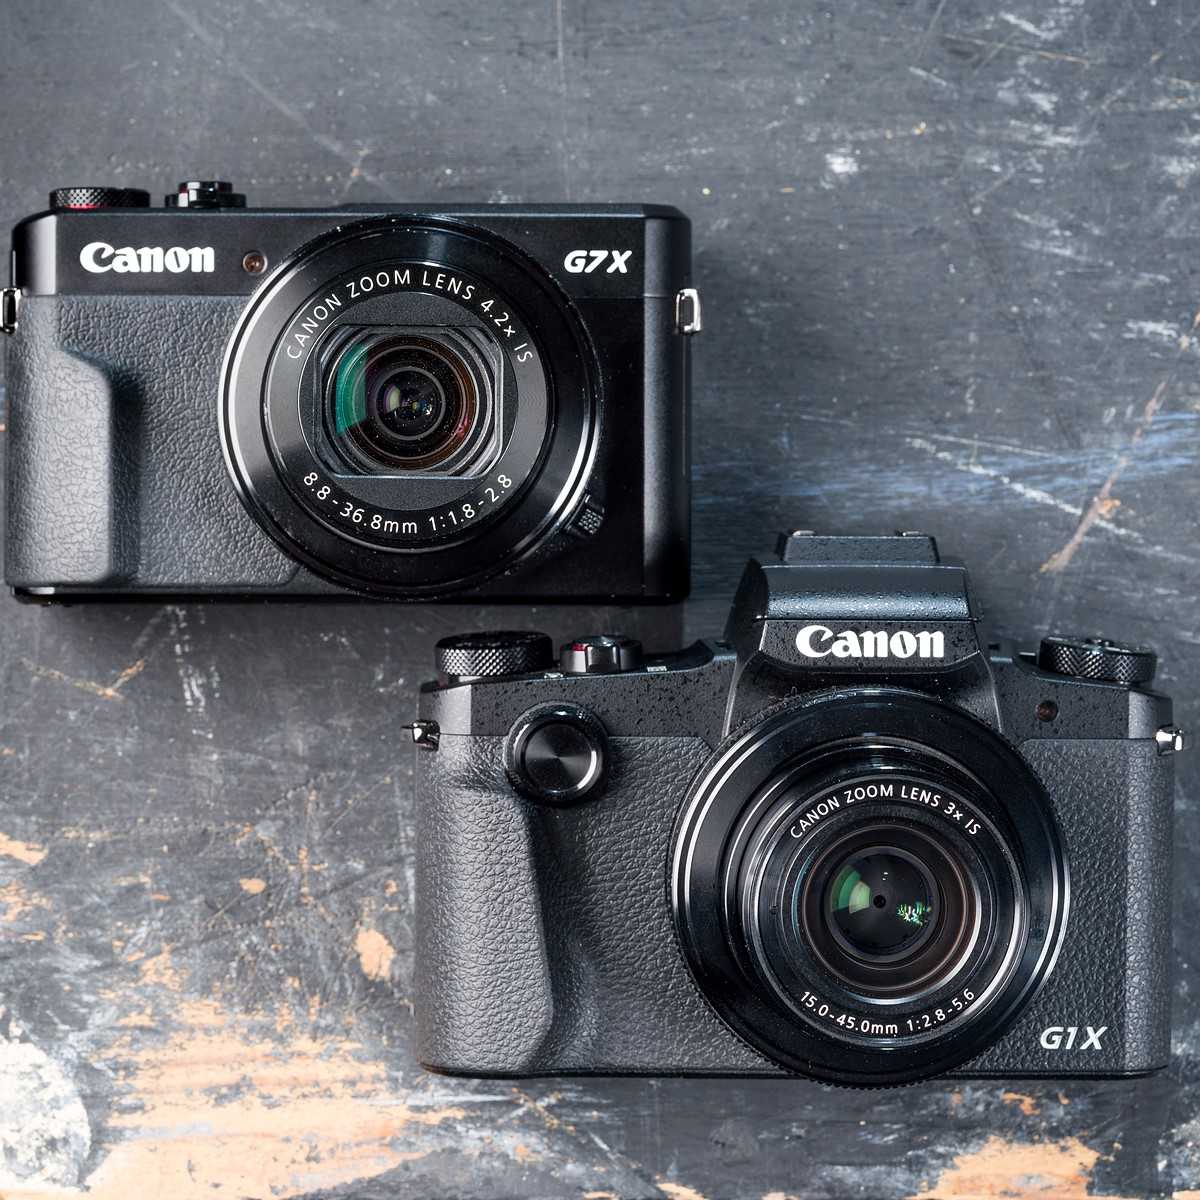 canon g7x ii vs g5x